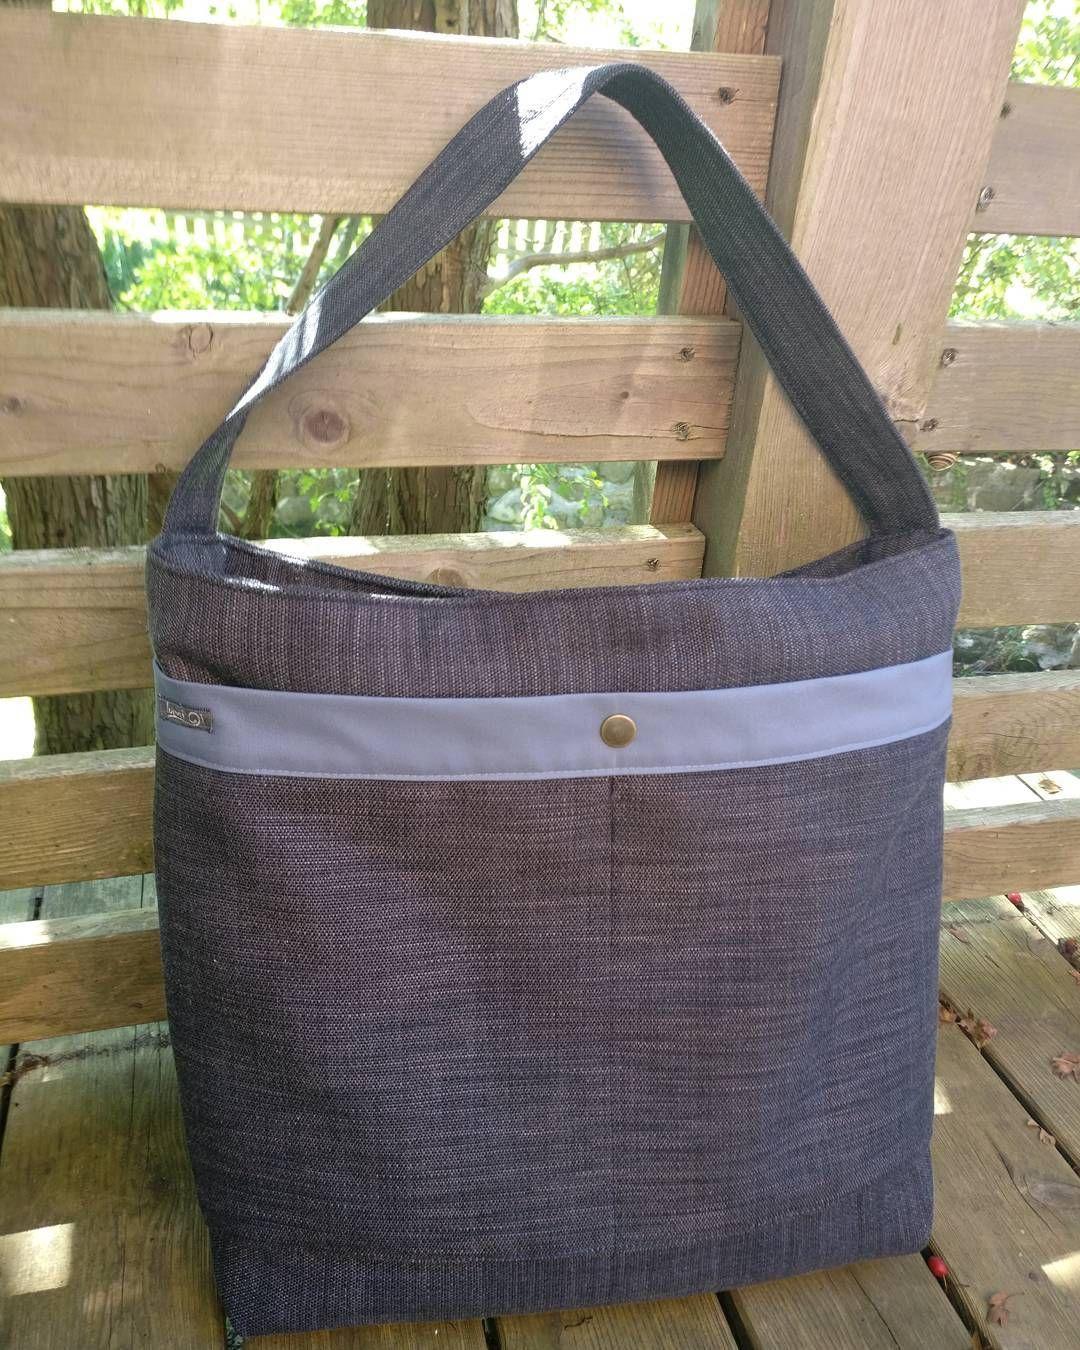 #lumibag #totebag #hobobag #shopper #stofftasche #selbstgemacht #handmade #withlove #bag #tasche #diy #nähen #sew #sewing bag@lumiqi.com